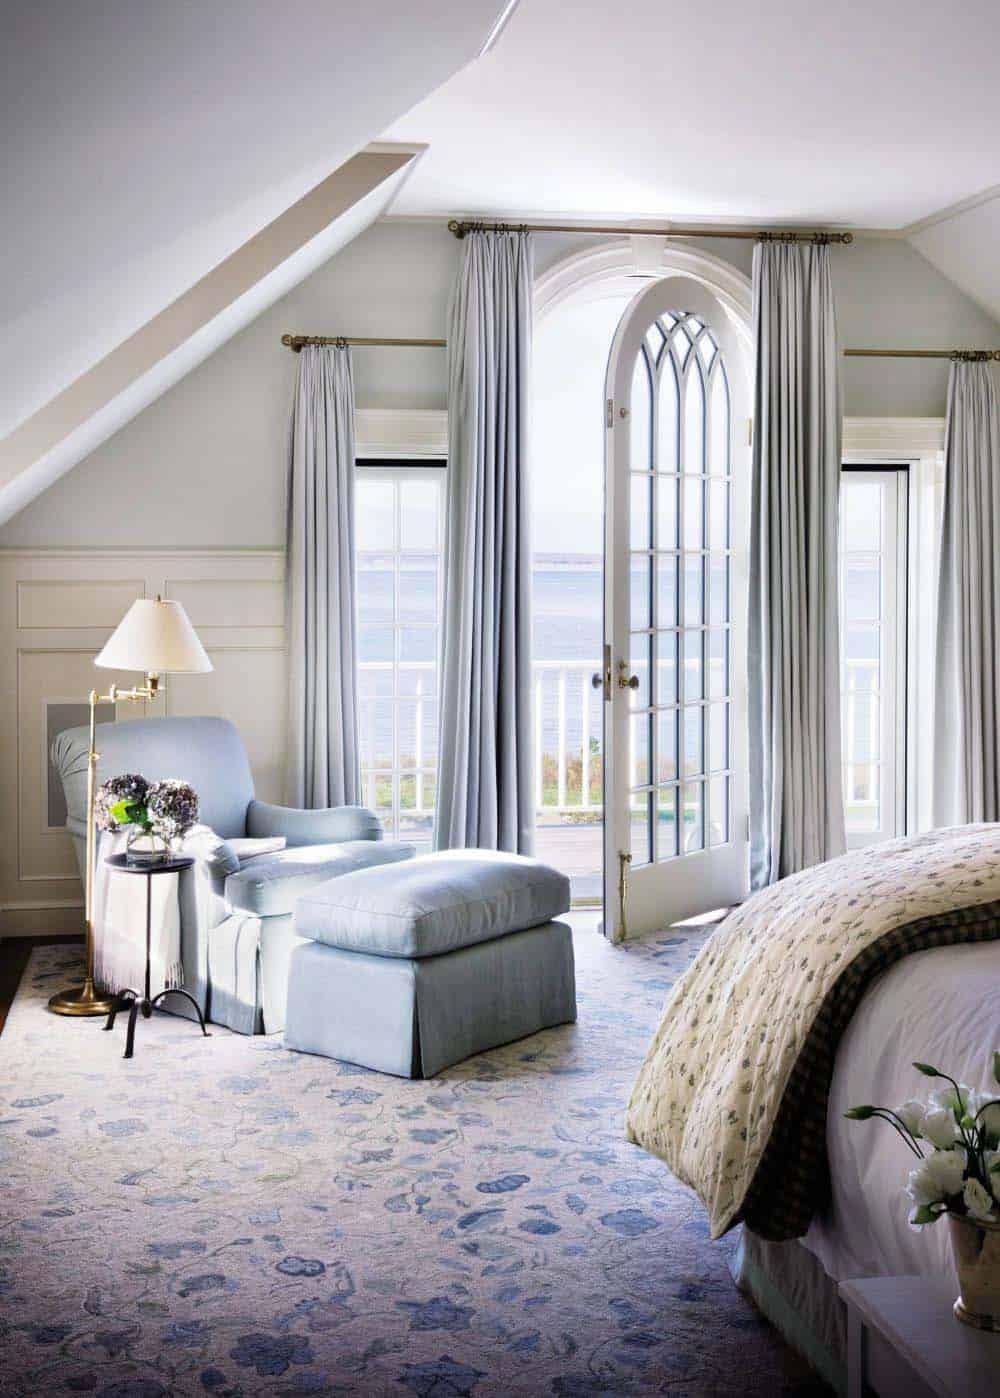 Bedroom With Ocean Views-28-1 Kindesign